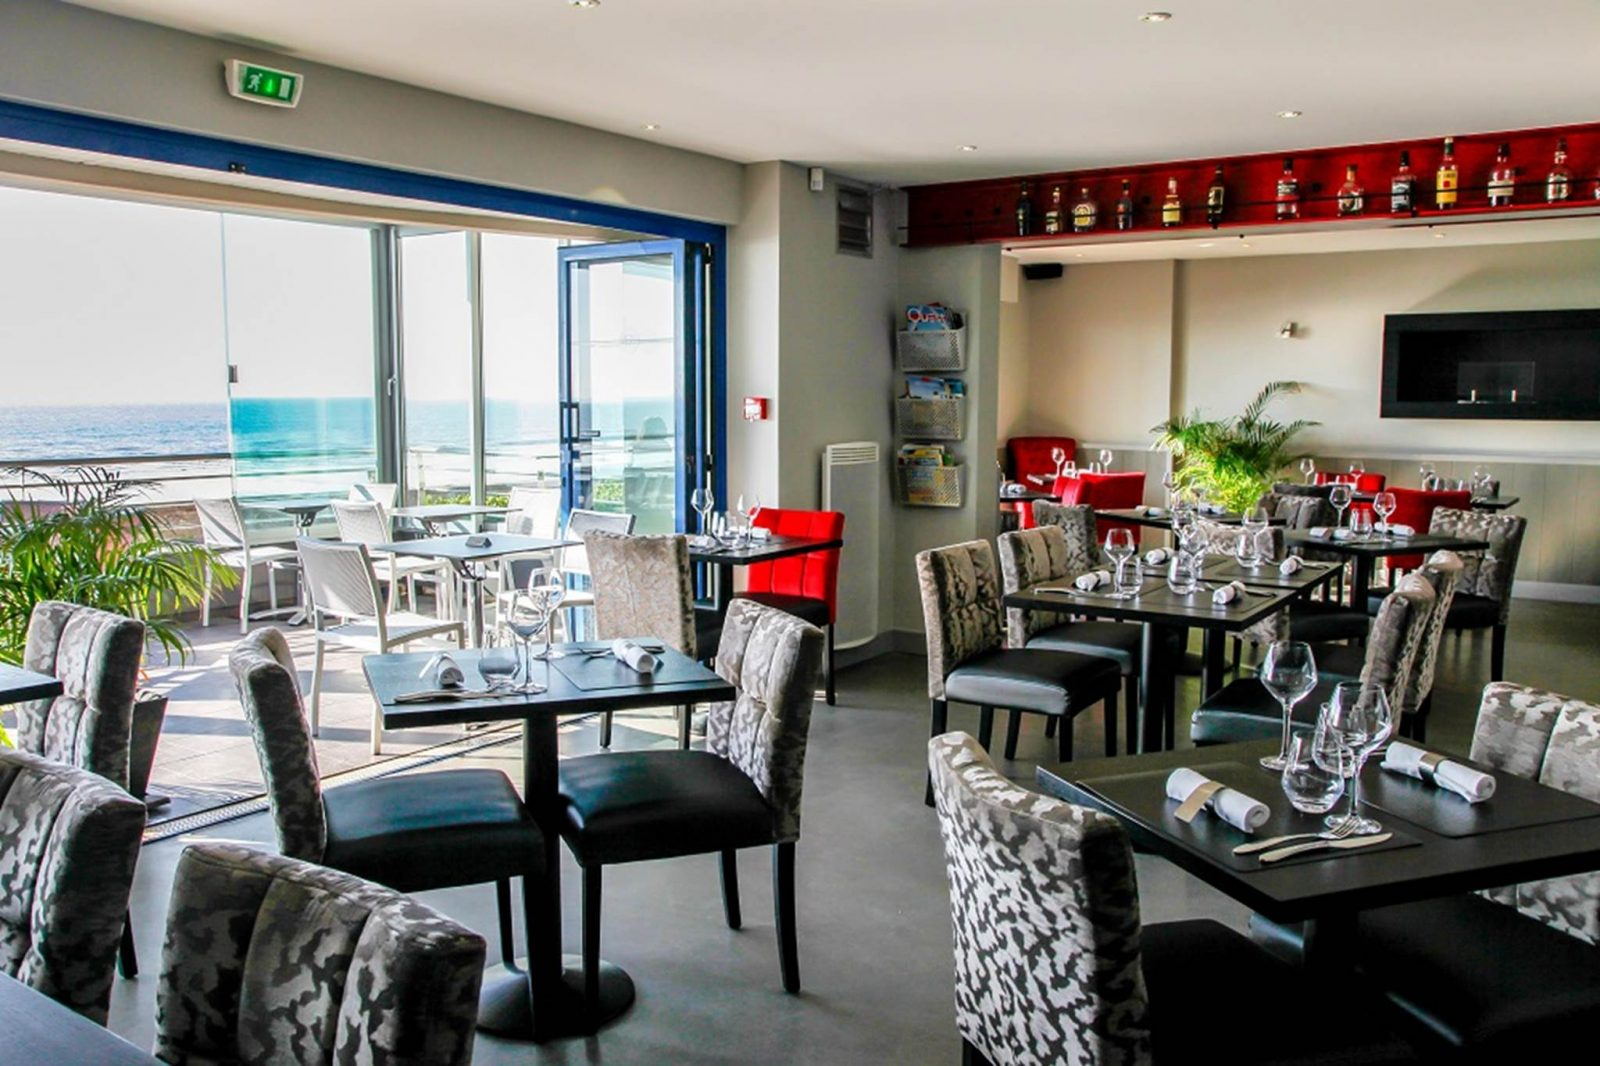 Restaurant latitude 47 Damgan Morbihan